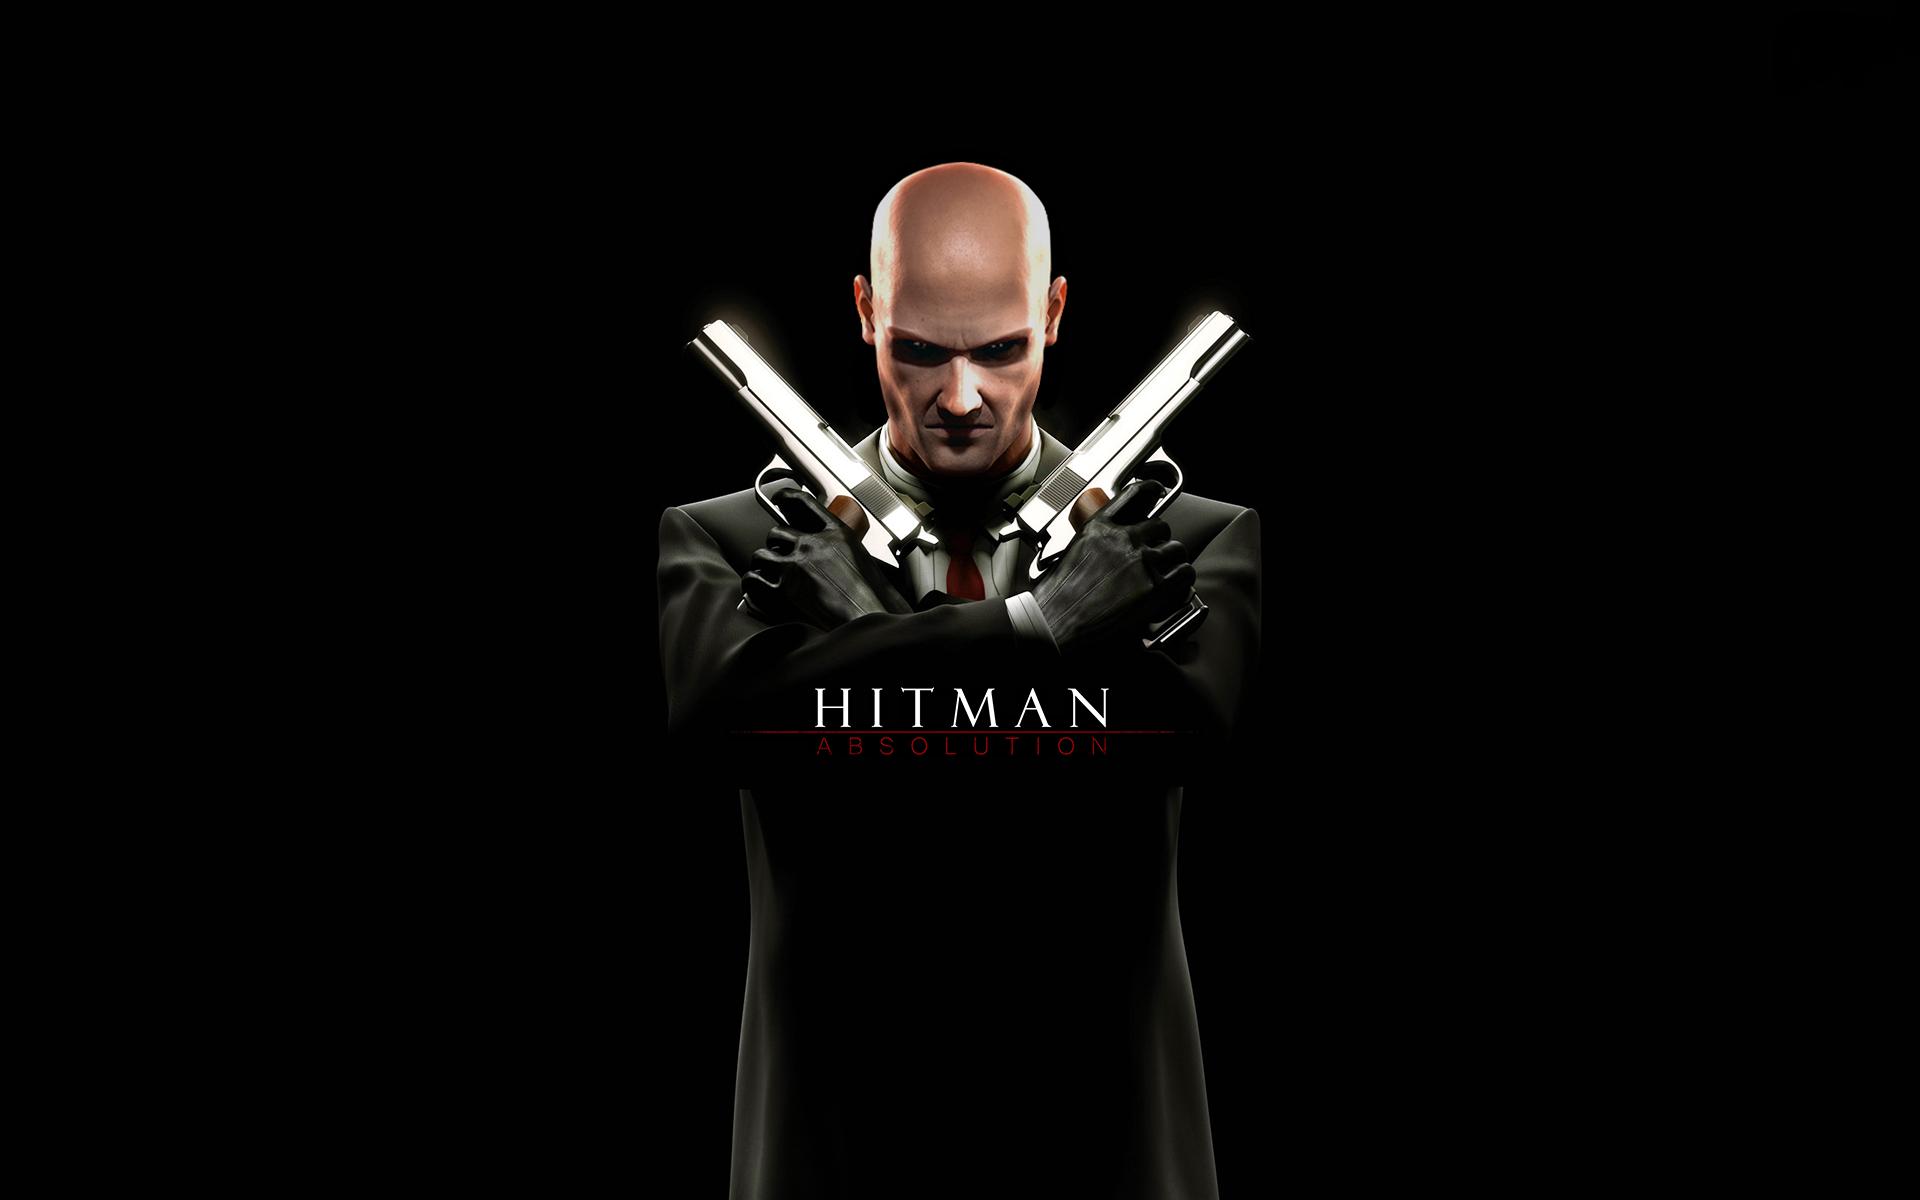 Hitman Game Images